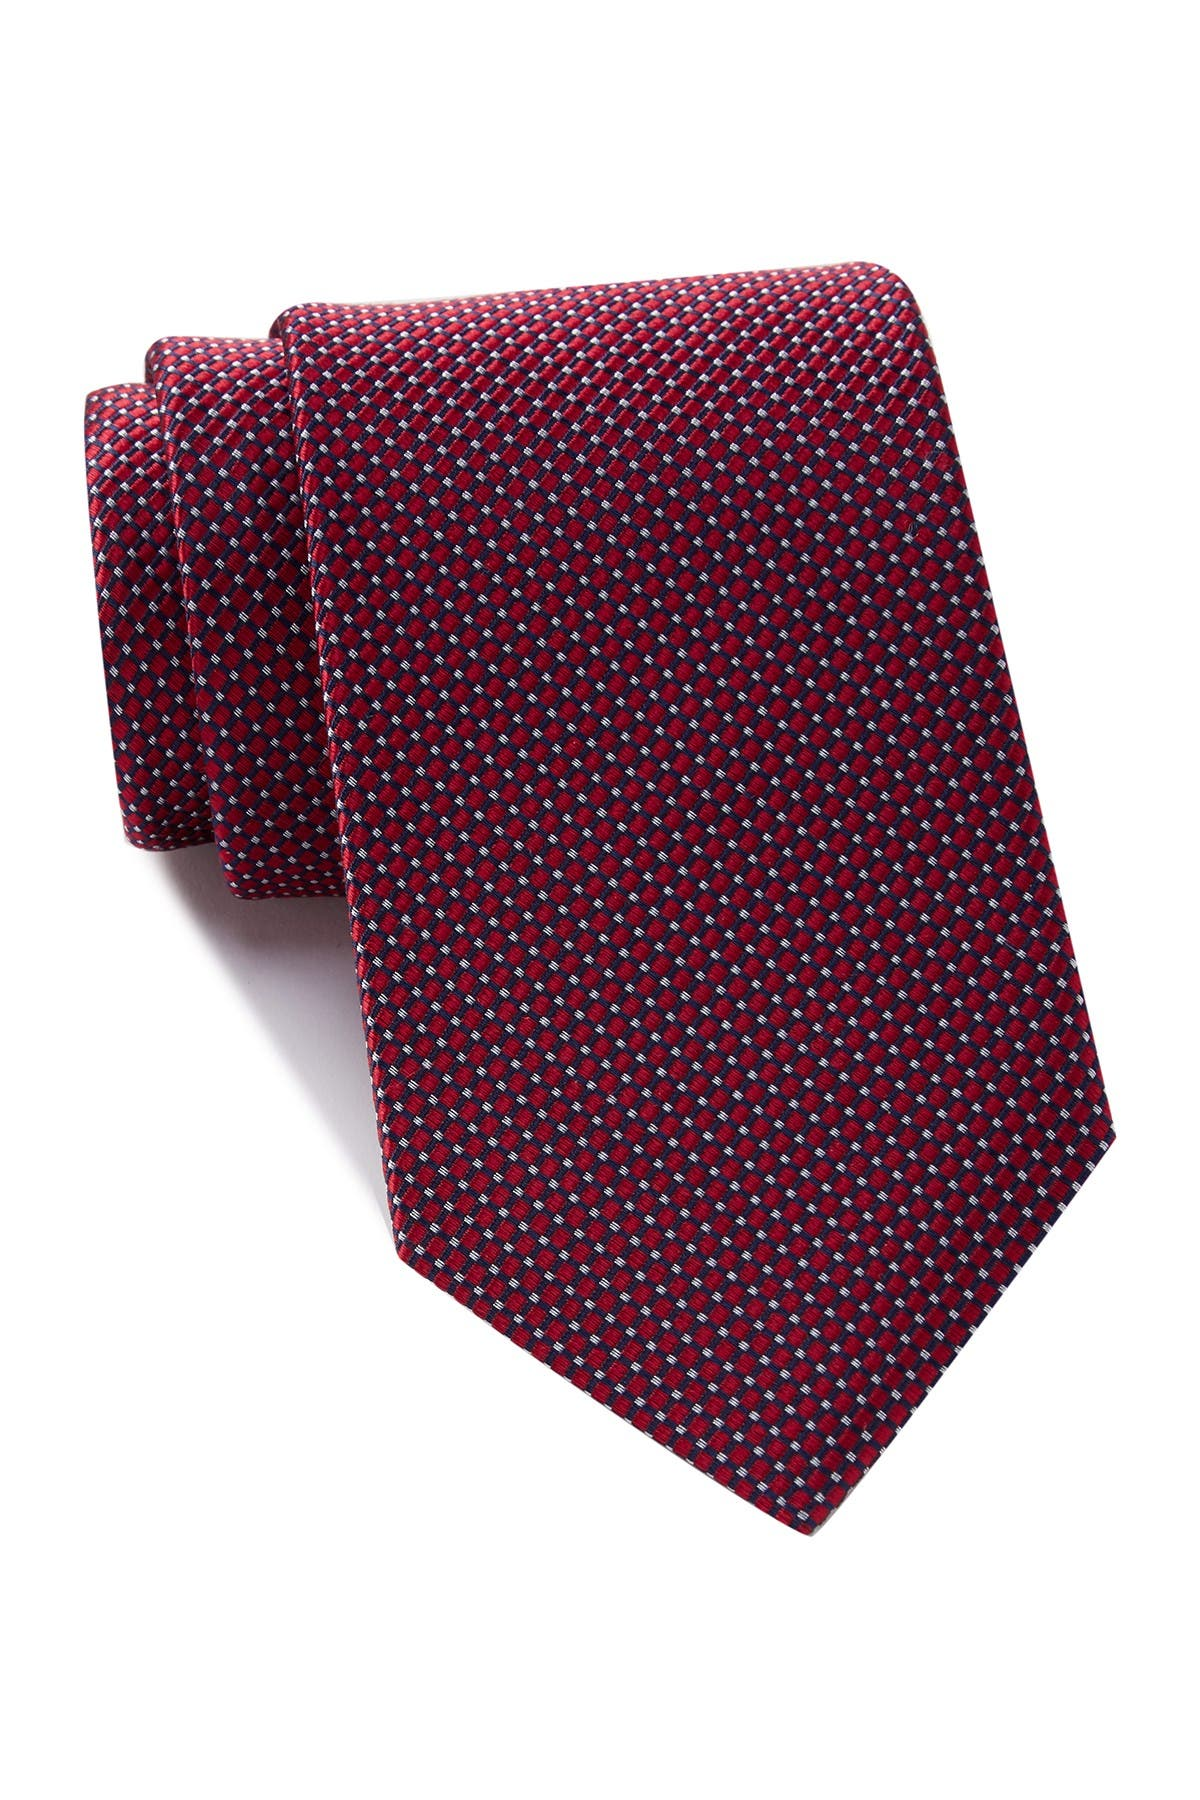 Image of Nordstrom Rack Frazier Mini Silk Tie